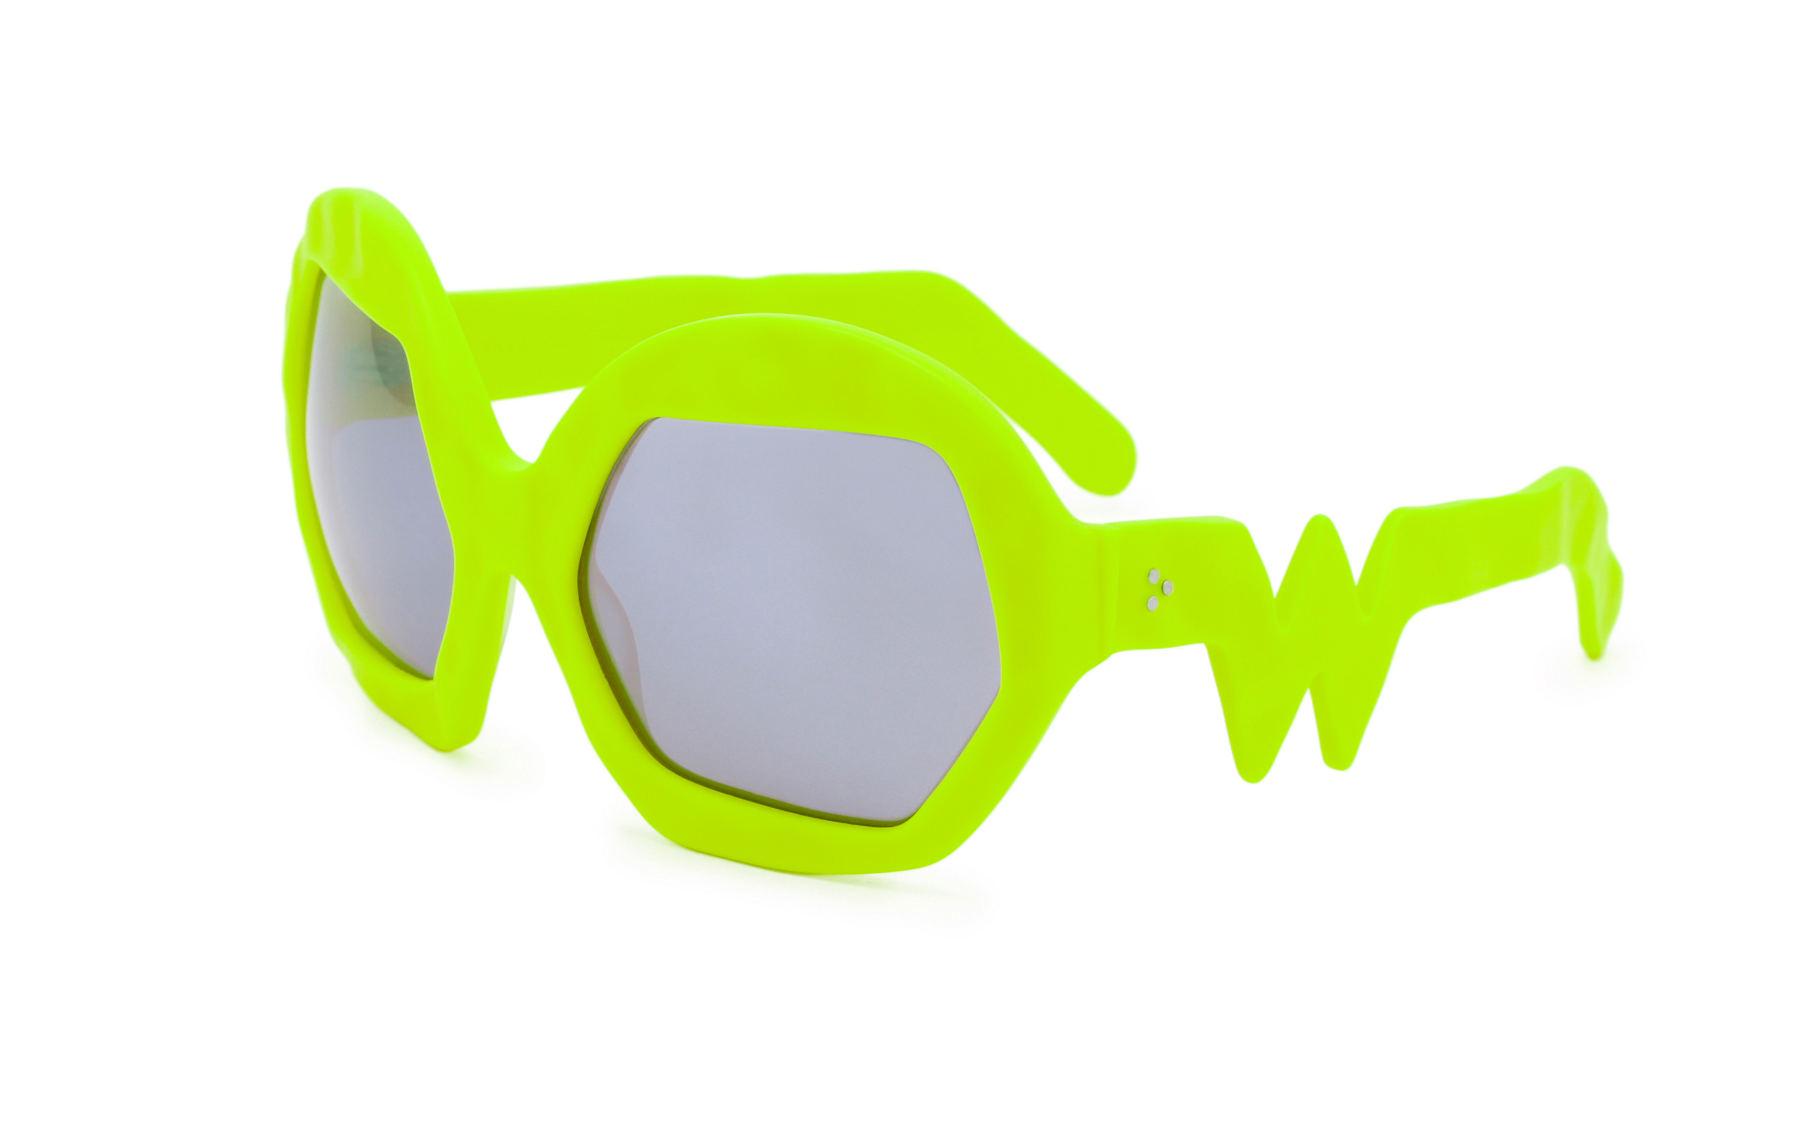 FAKBYFAK x Walter Van Beirendonck  Donder Sunglasses. Neon Yellow Code: 09/14/07